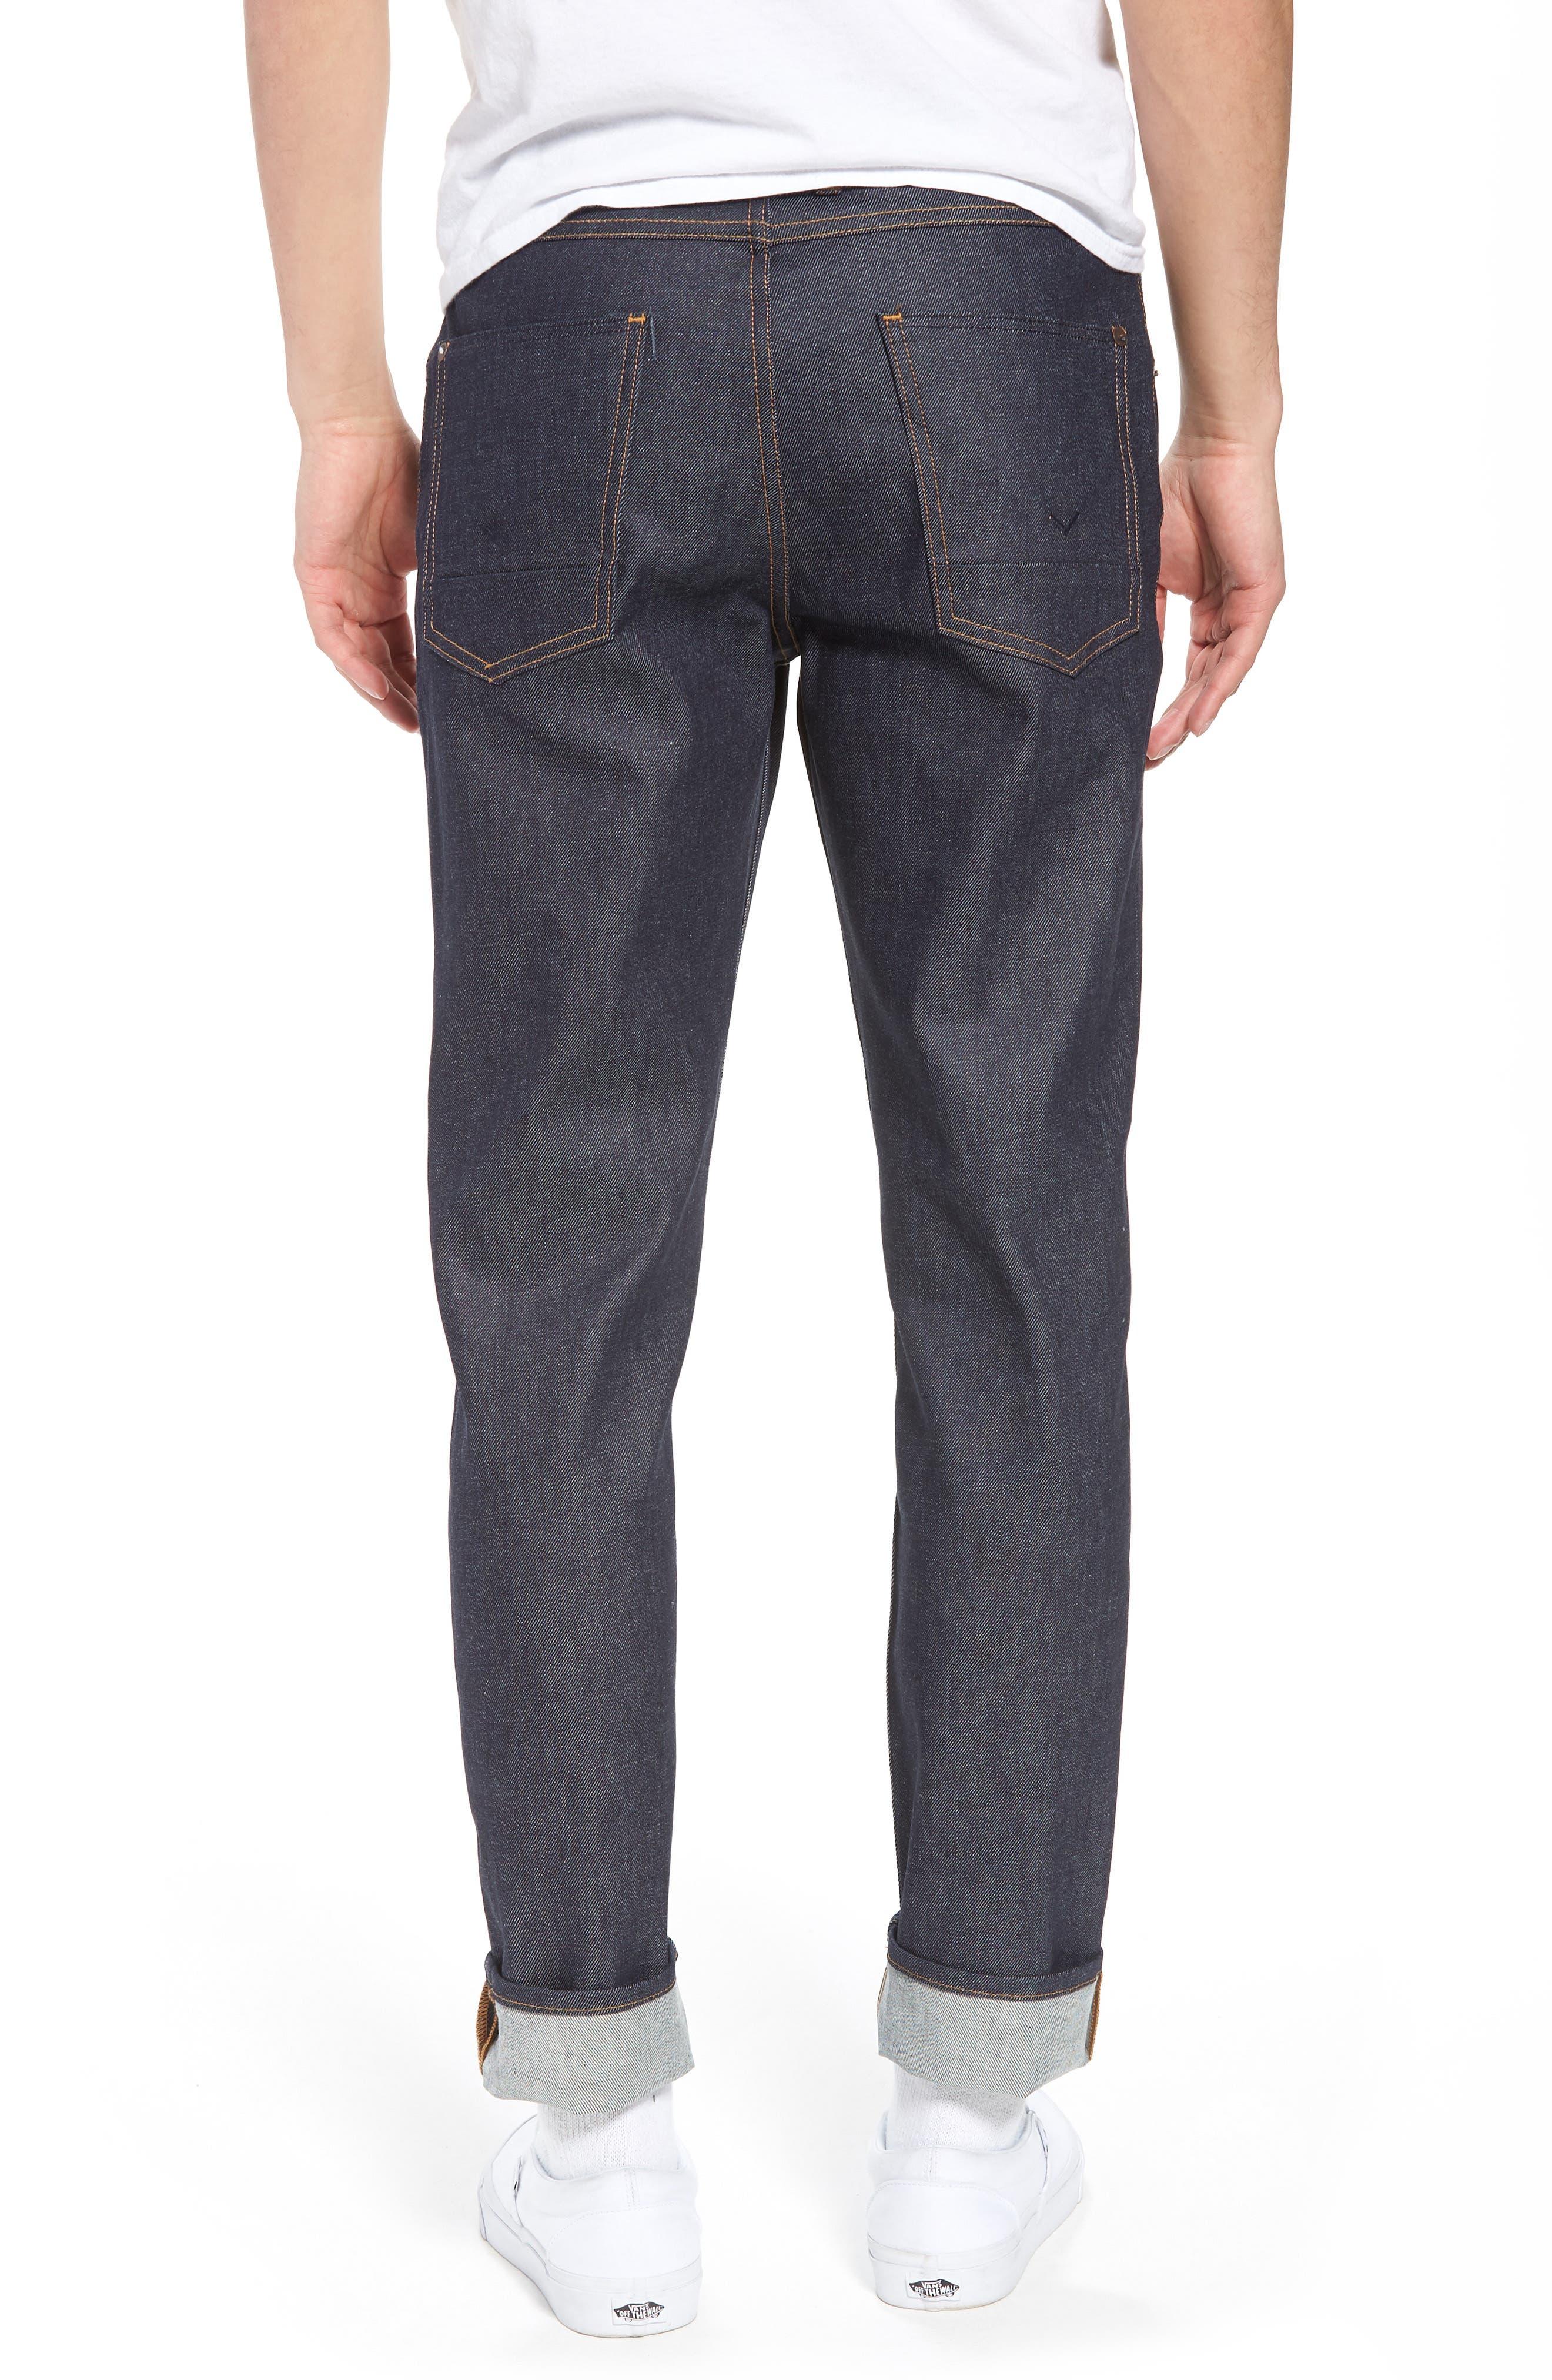 Sartor Skinny Fit Jeans,                             Alternate thumbnail 2, color,                             Raw